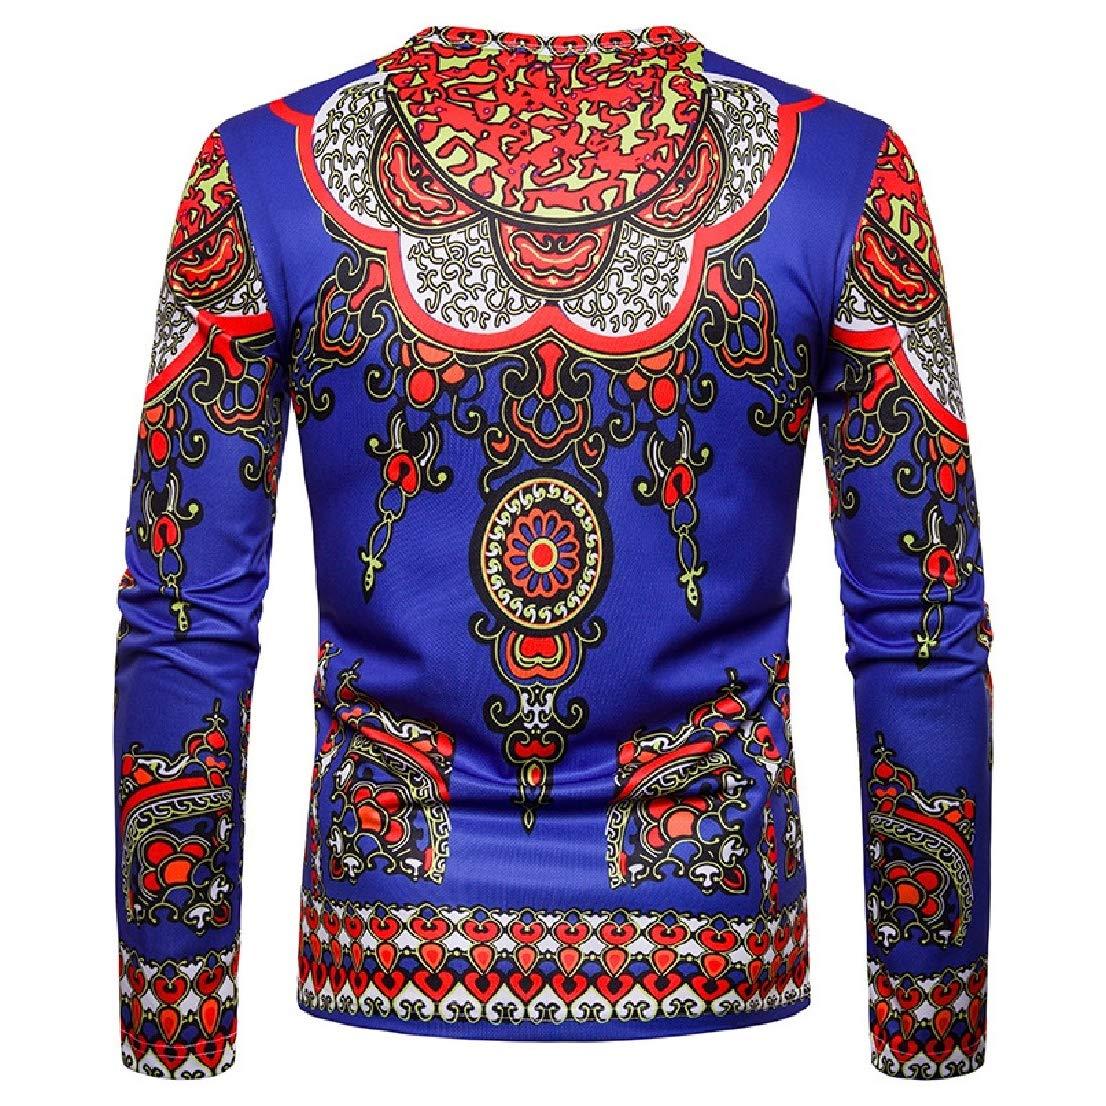 BAYYMen Autumn O-Neck Long Sleeve Navajo Floral Pullover Tees Top